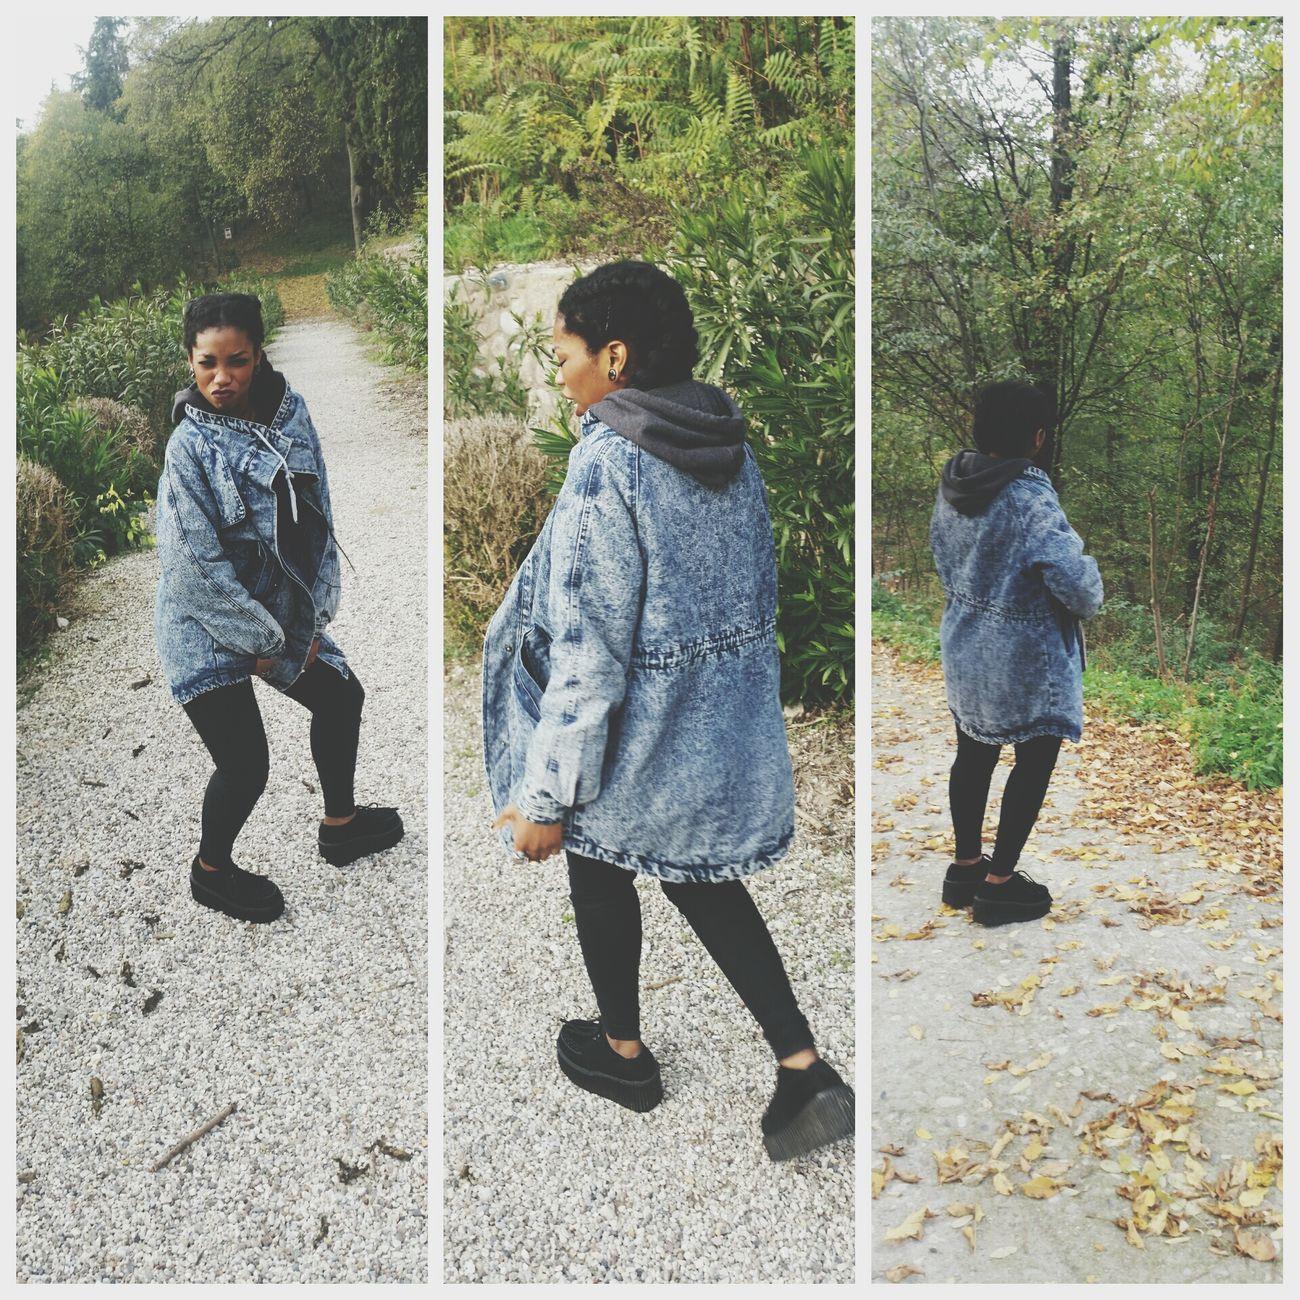 Photography Tumblr Italy Style Artistic Photo Alternativemodel Fashion Cavriana Autumn Mantova